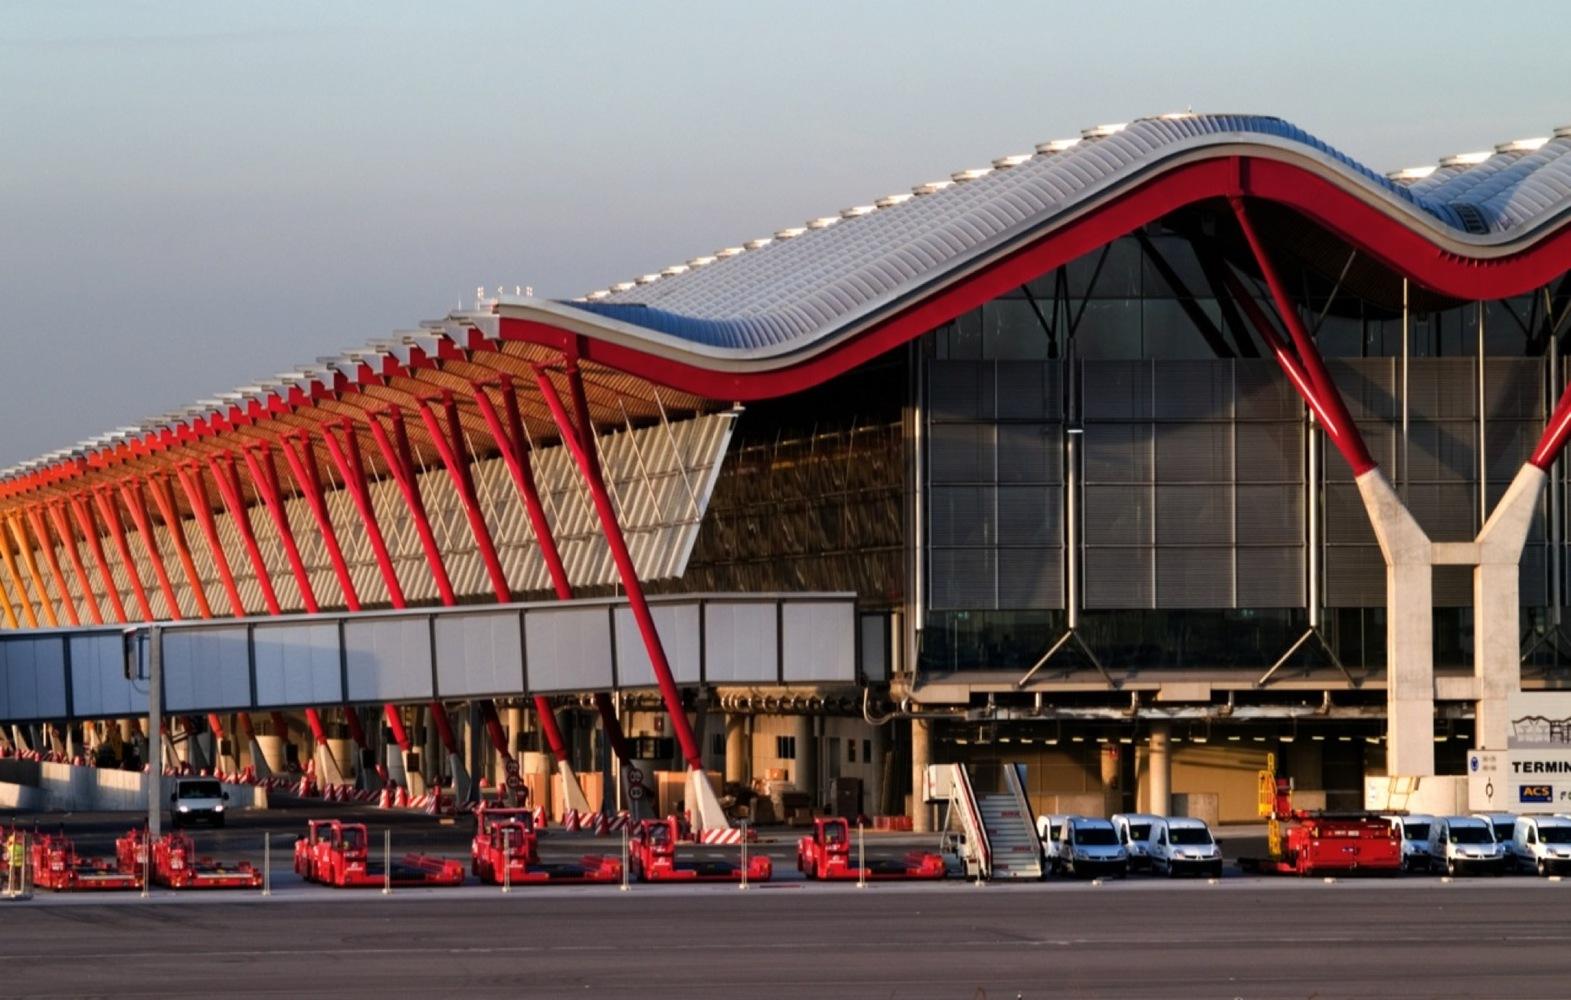 6418f312b0b Madrid-Barajas Airport Terminal 4 / Estudio Lamela & Rogers Stirk Harbour +  Partners